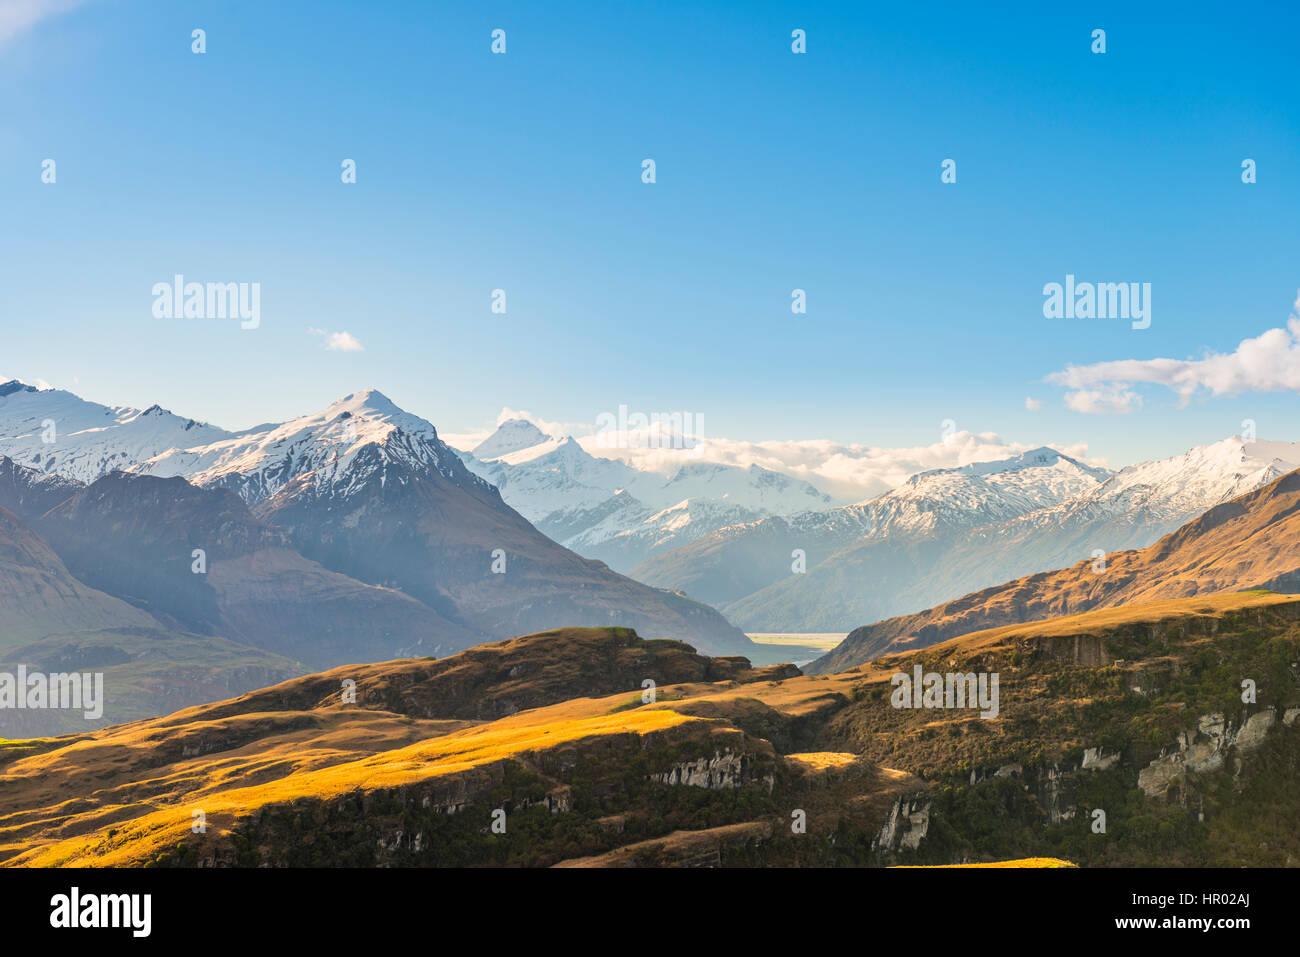 View of Mount Aspiring, Rocky Peak, Glendhu Bay, Otago Region, Southern Alps, Southland, New Zealand - Stock Image